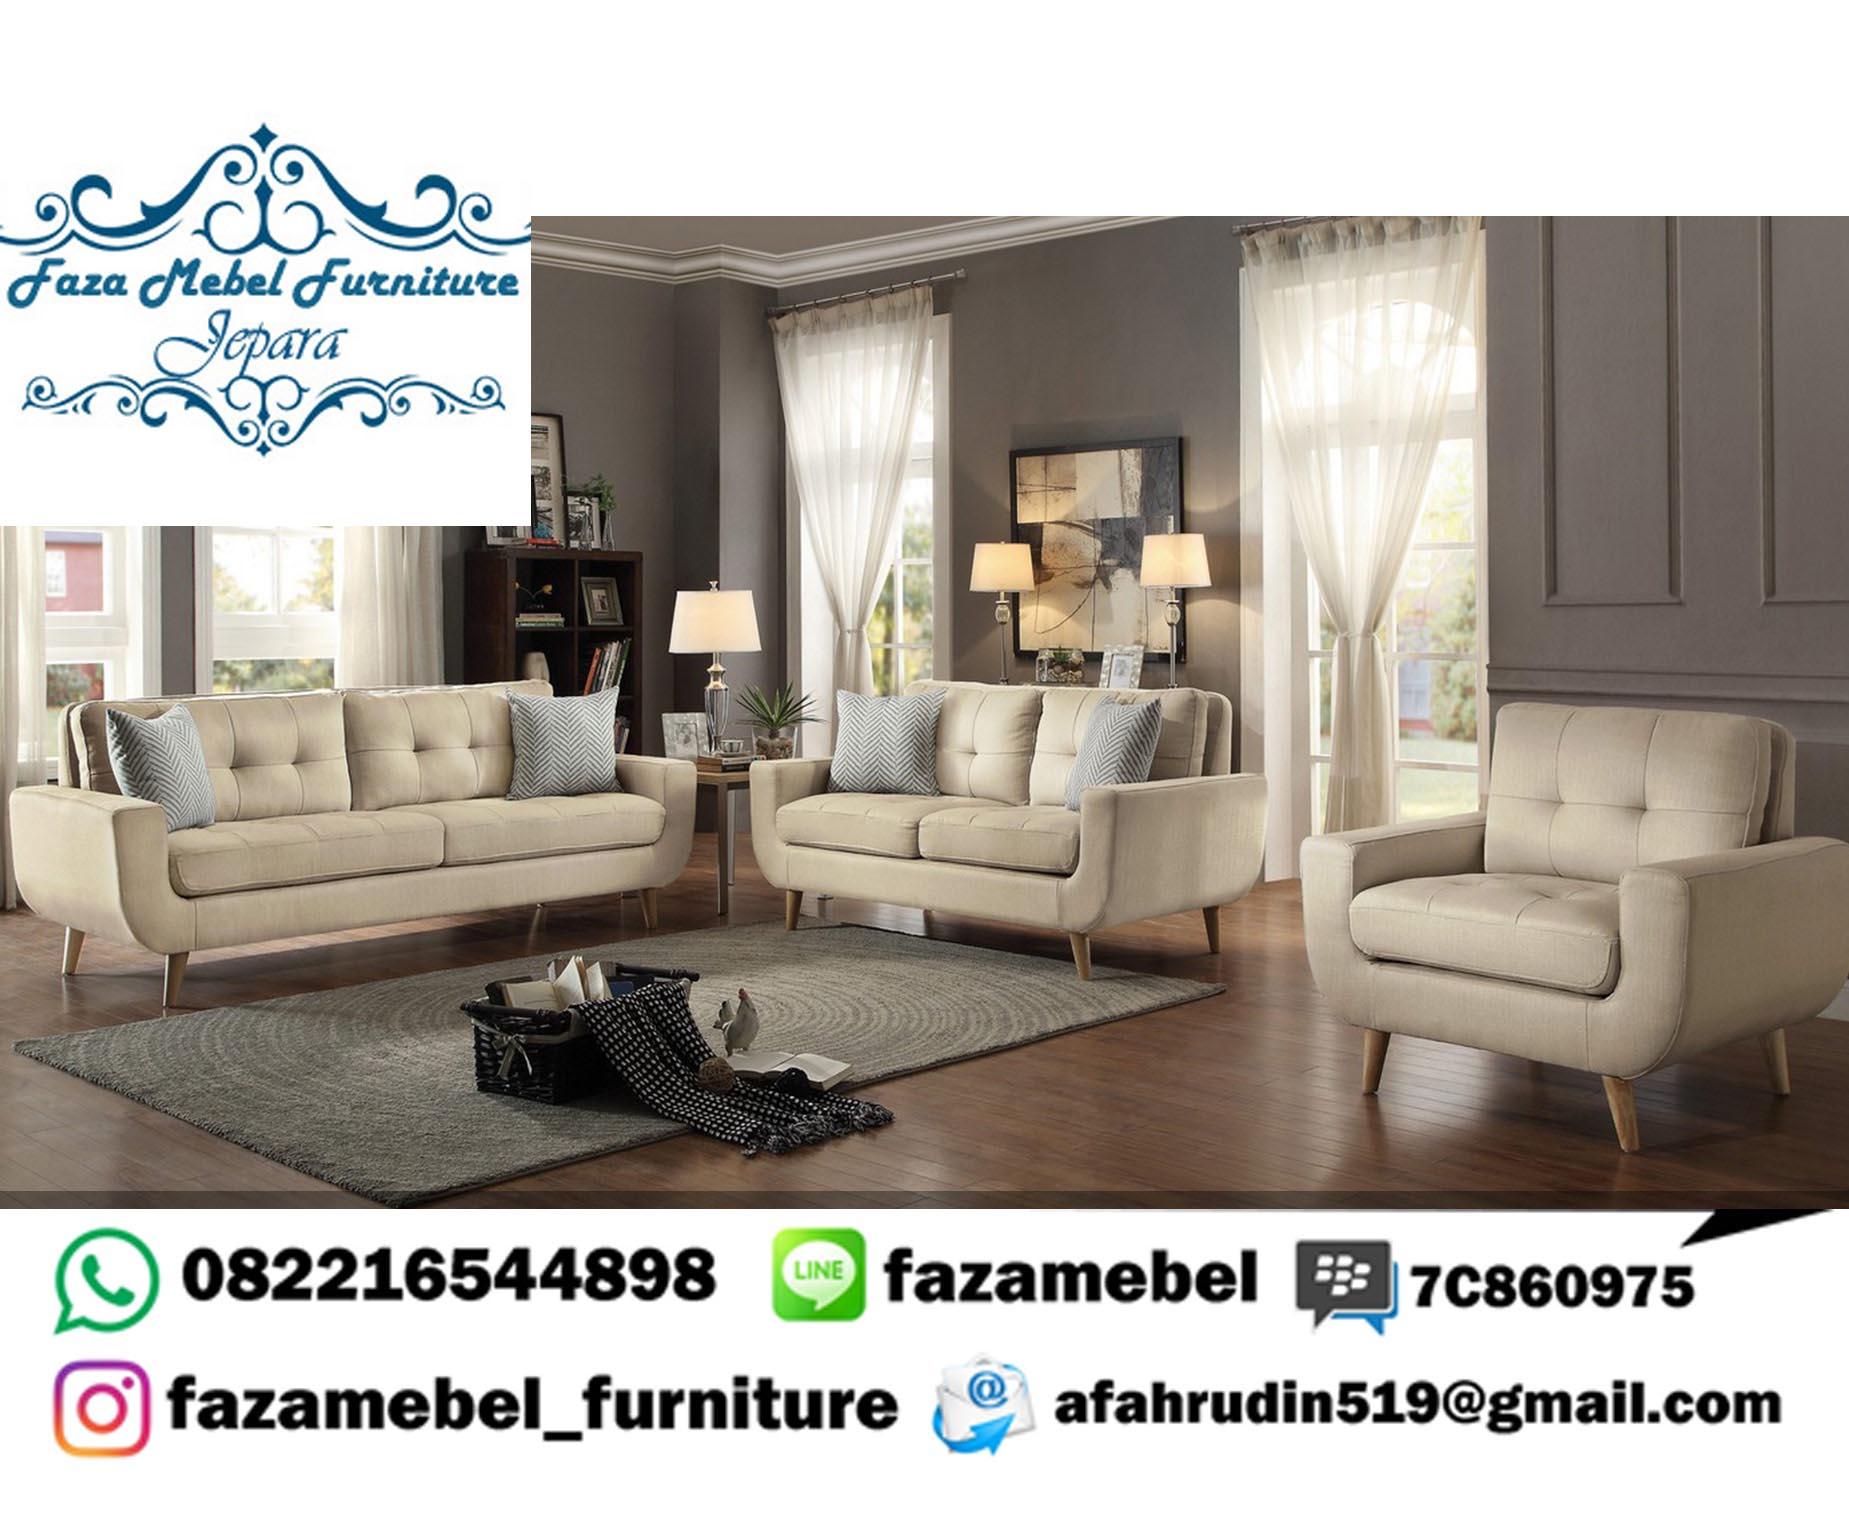 harga-sofa-tamu-minimalis-modern (6)